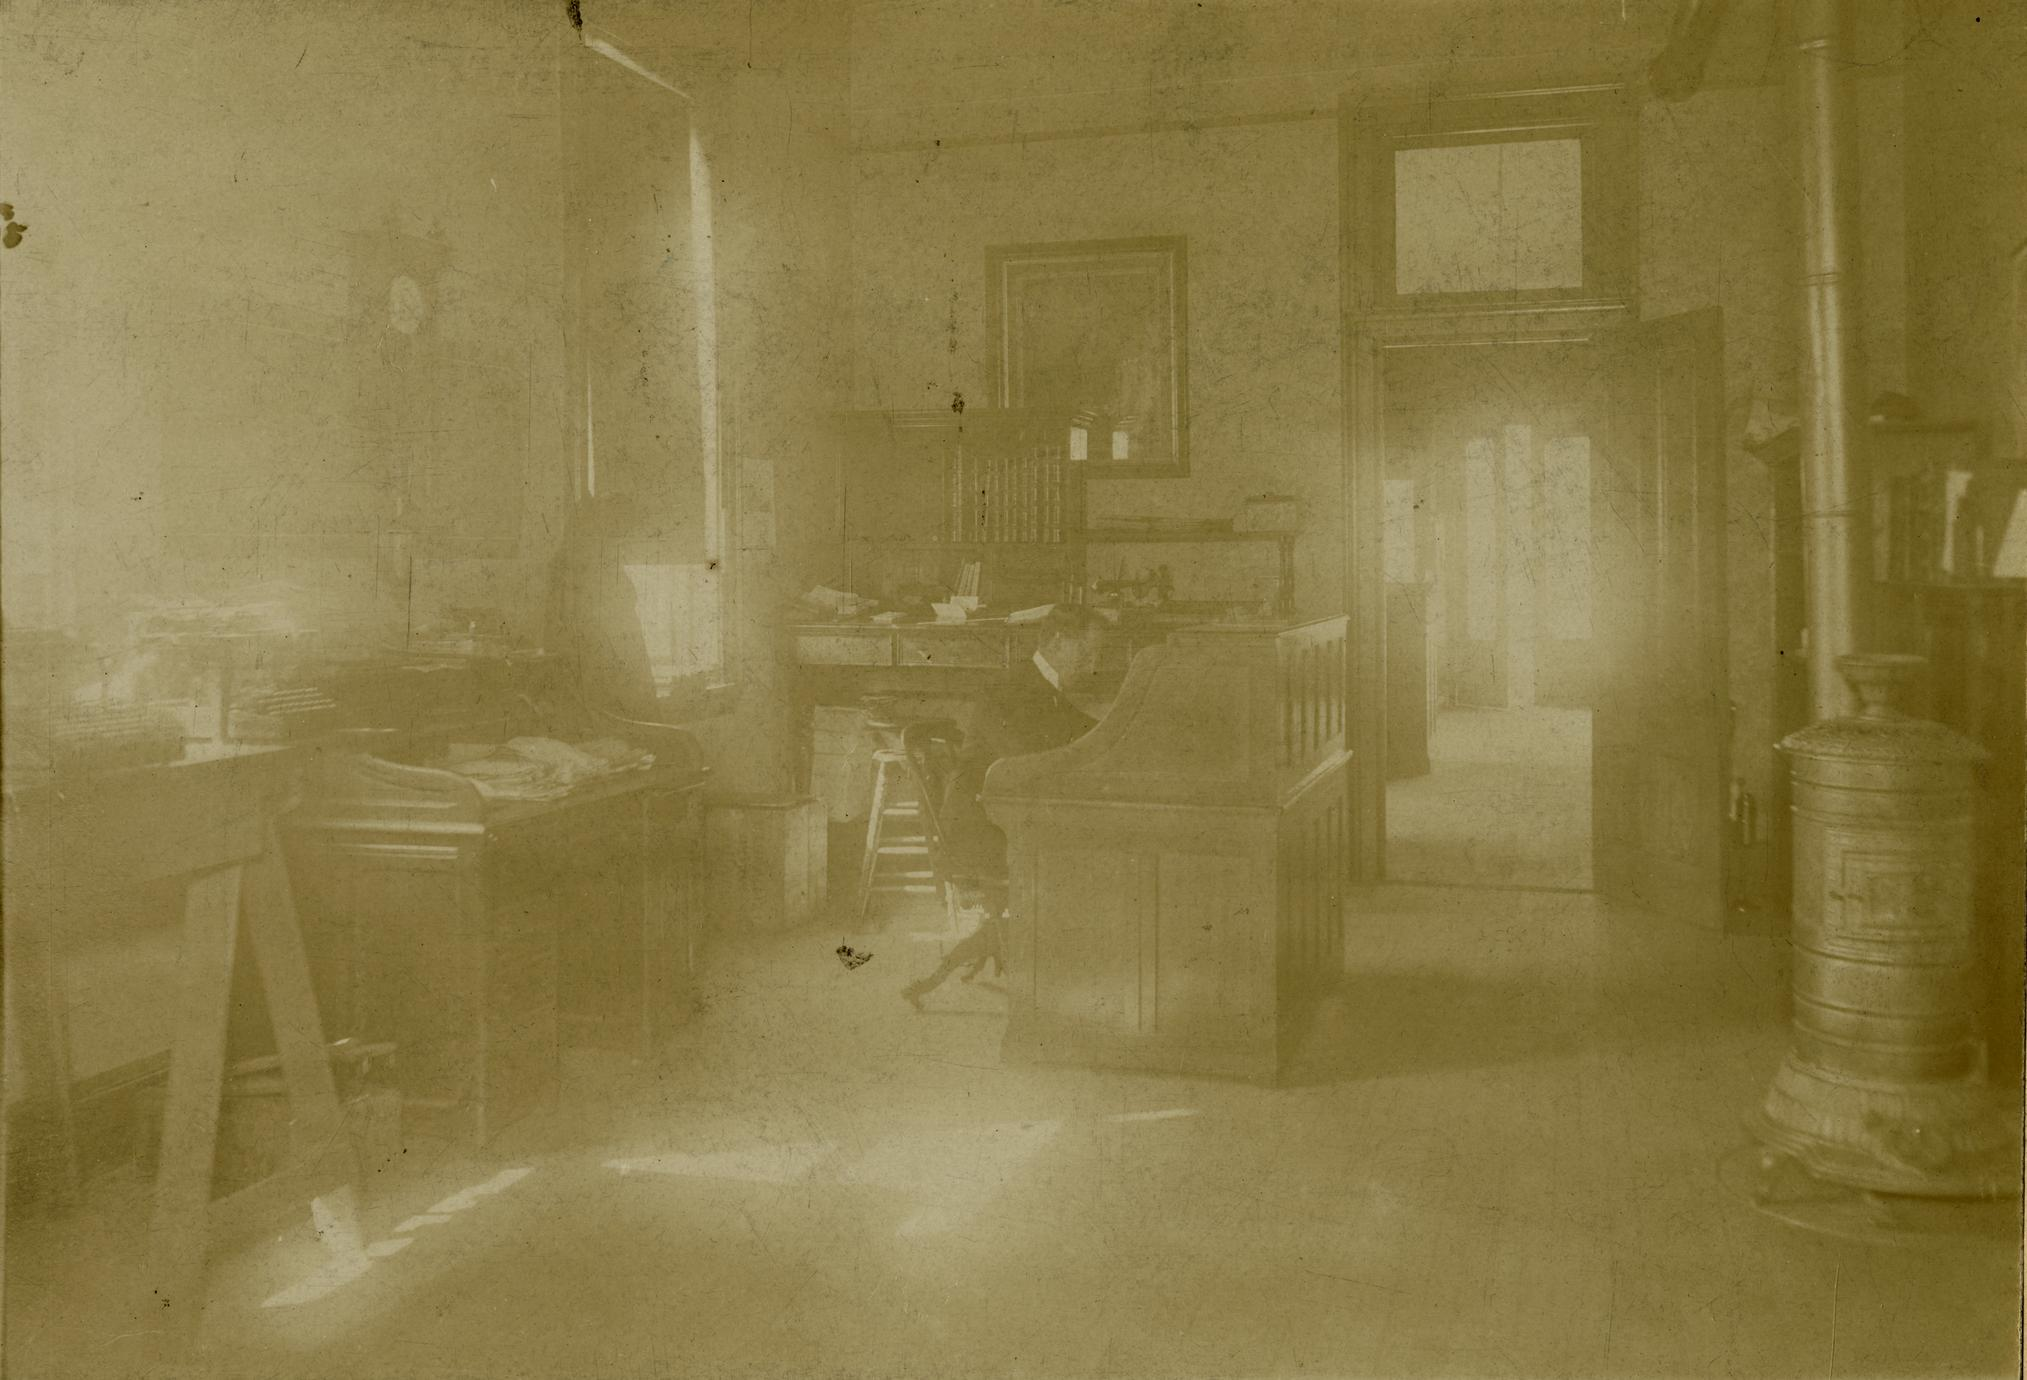 Zalmon G. Simmons' secretary inside his office